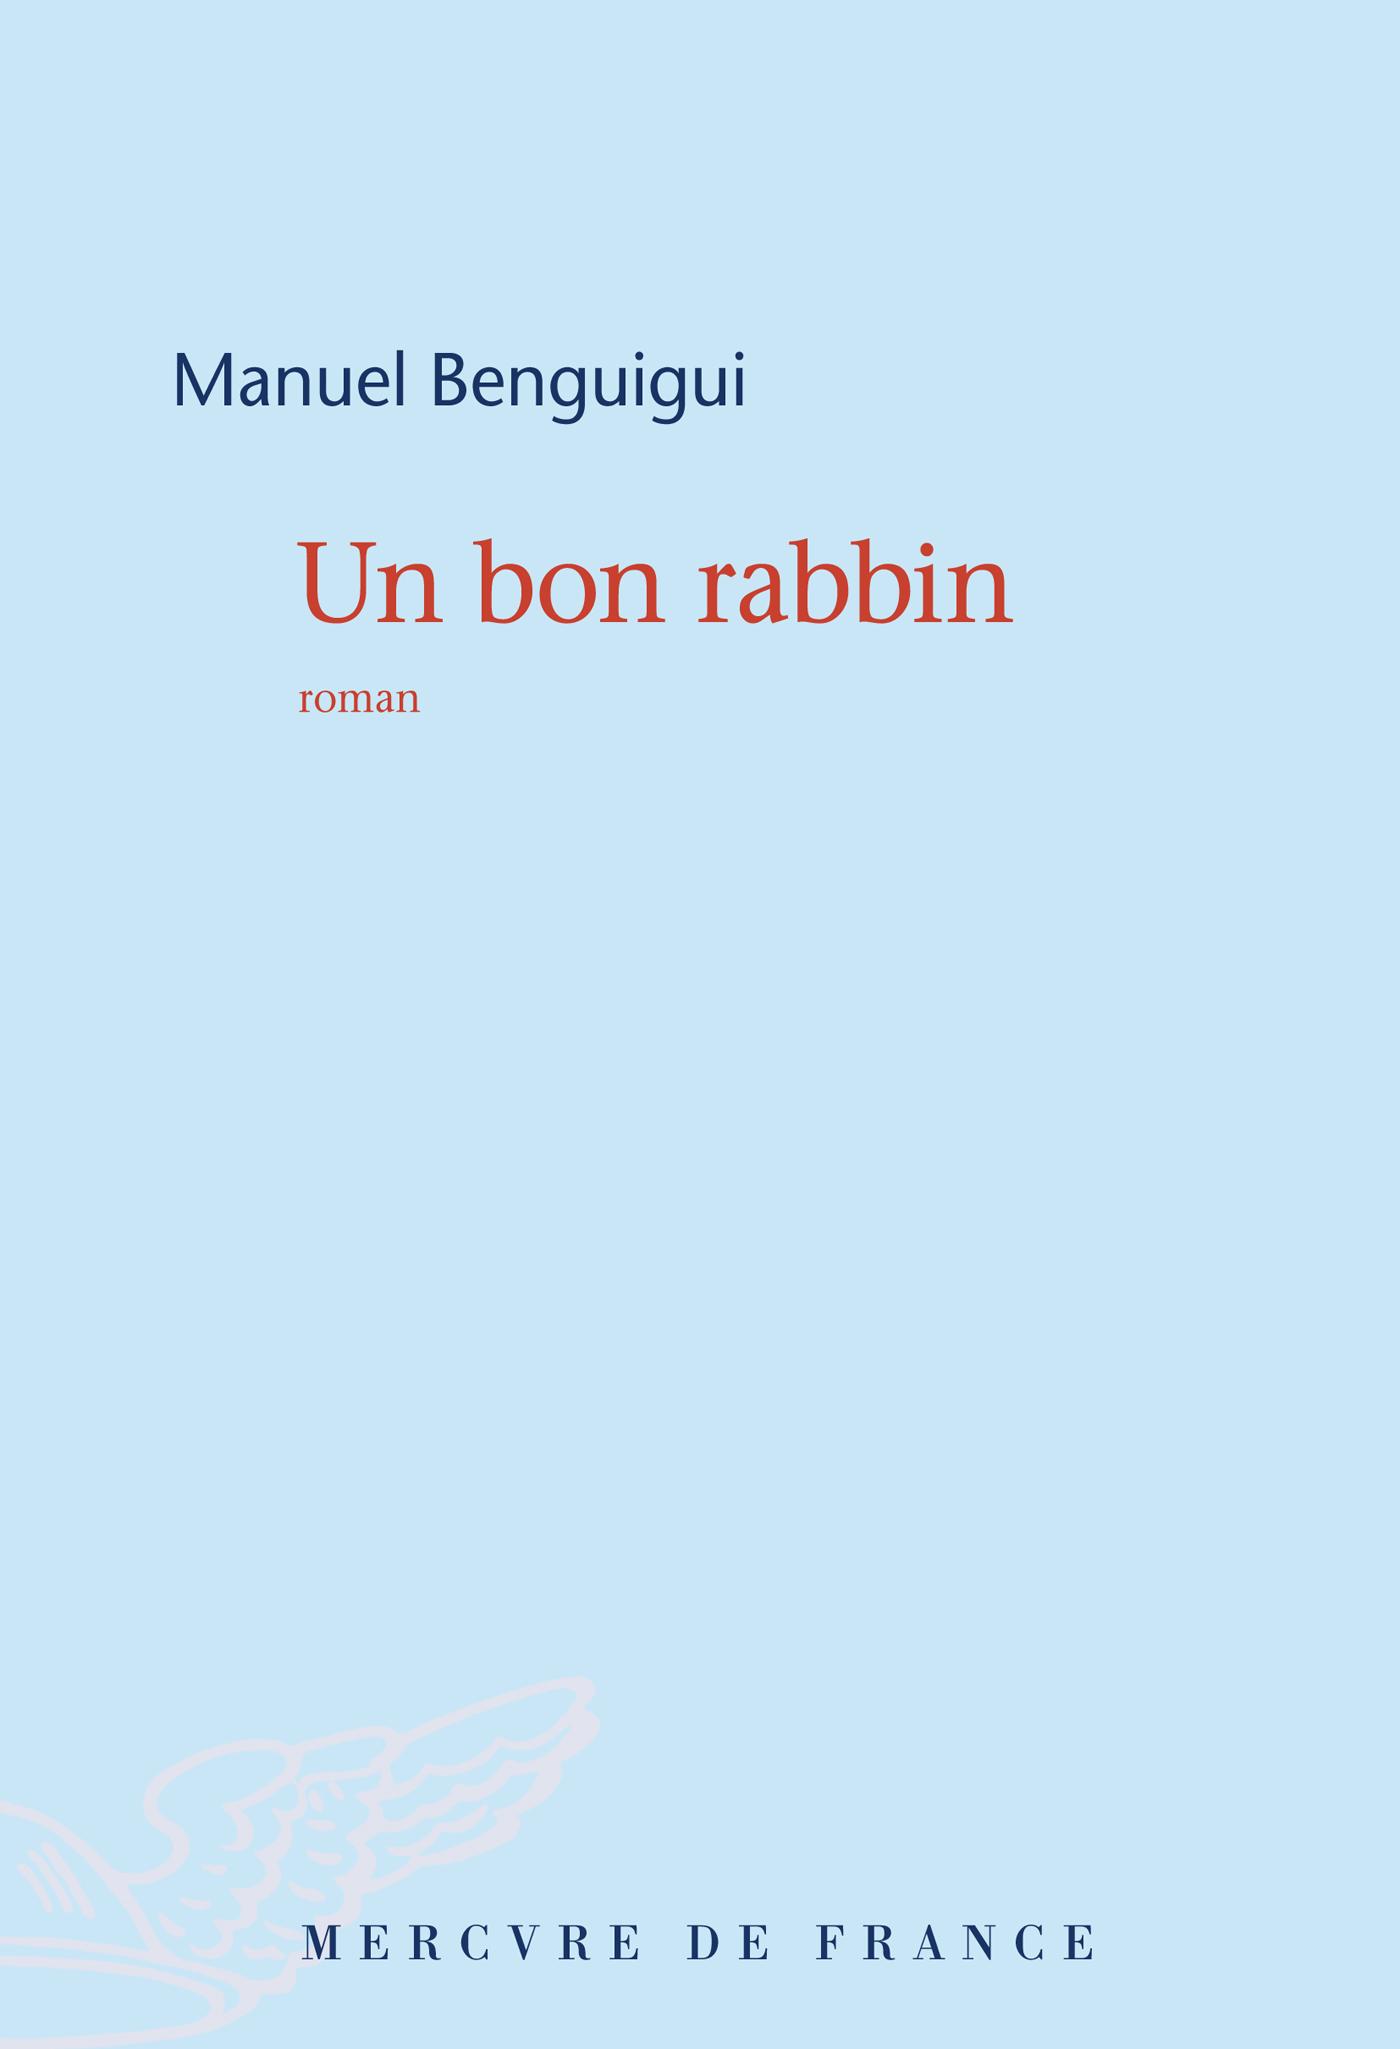 Un bon rabbin |